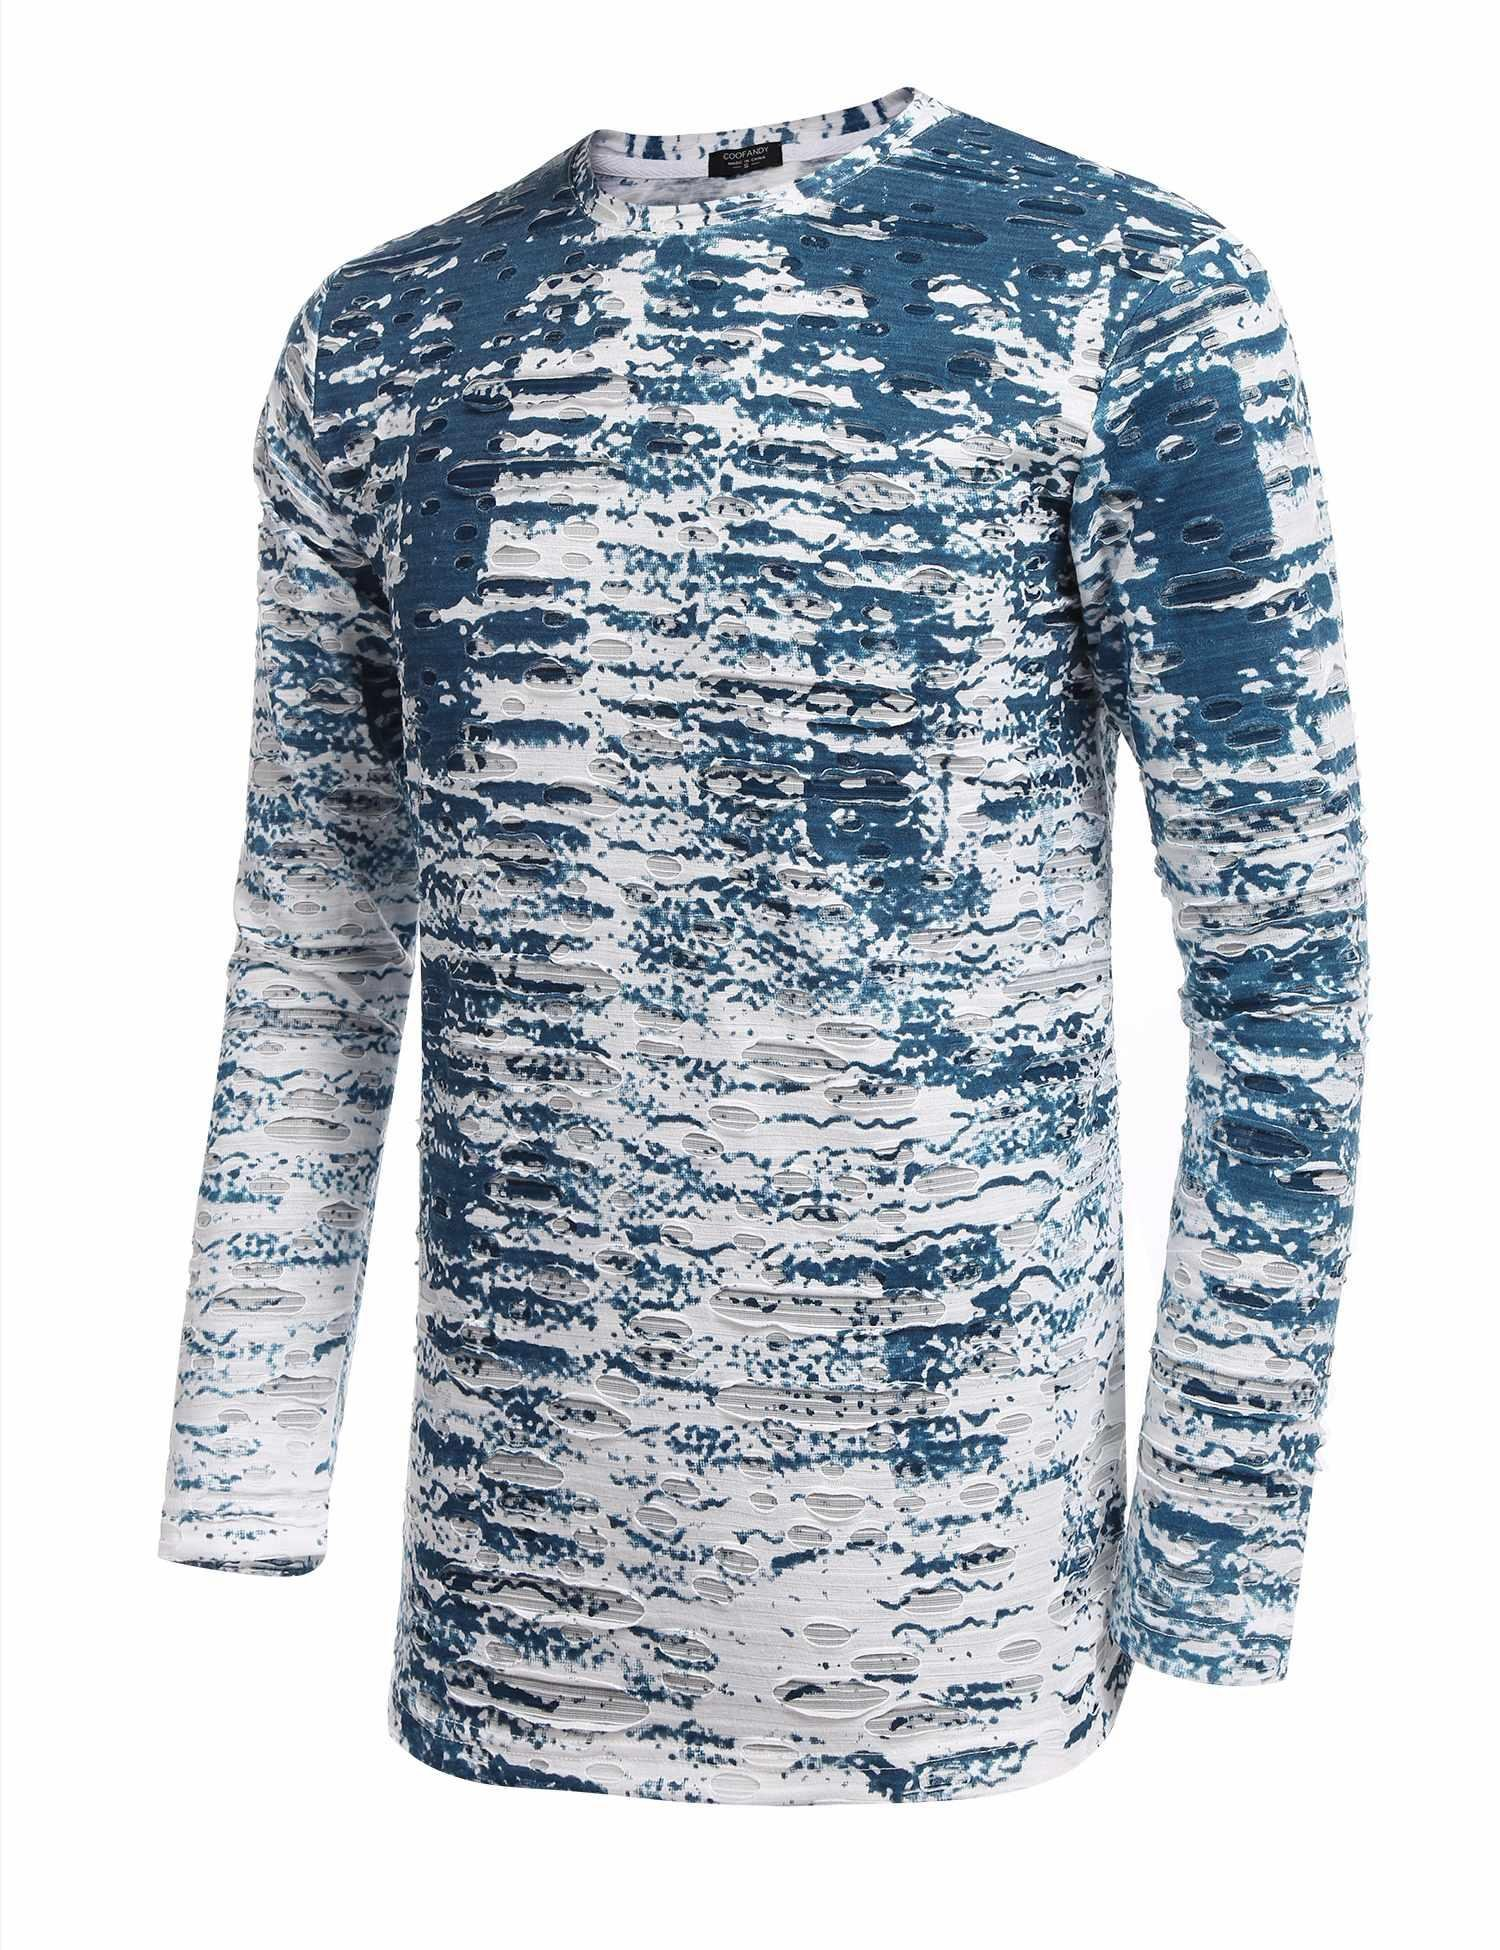 JINIDU Mens Hipster Hip Hop Ripped Long Sleeve Basic Tops T Shirt with Holes